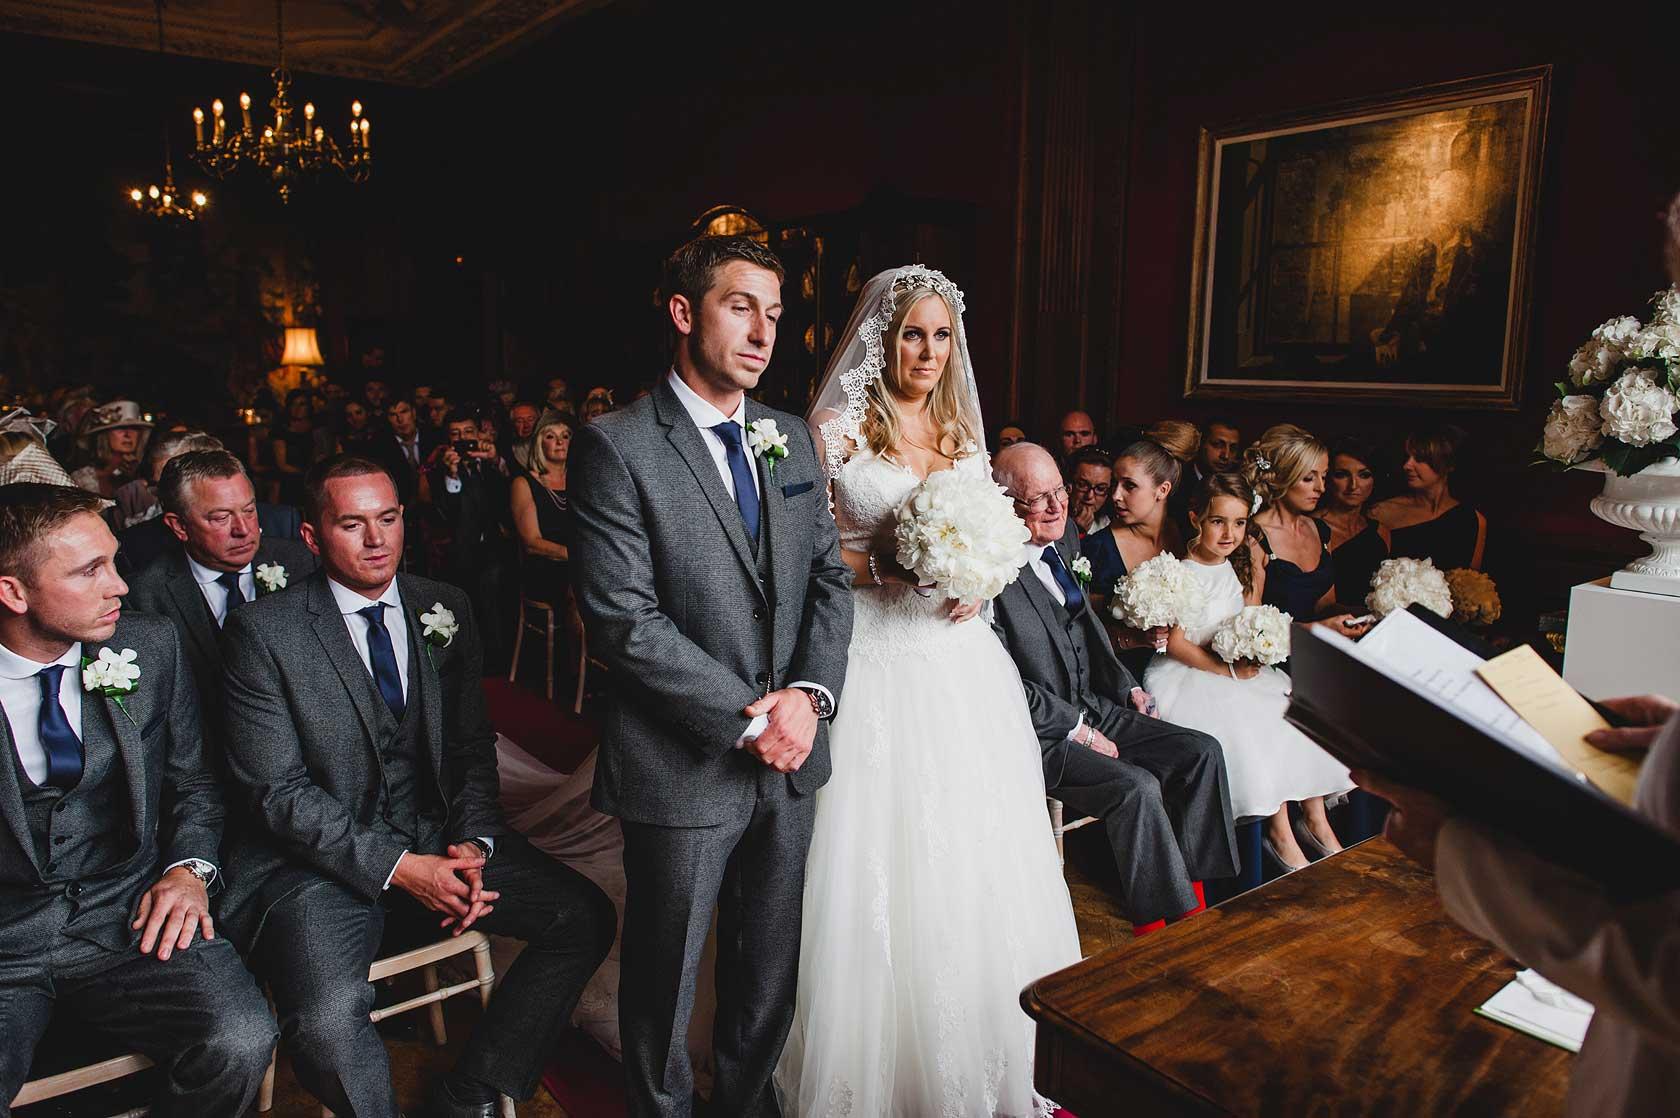 Reportage Wedding Photography at Thornton Manor